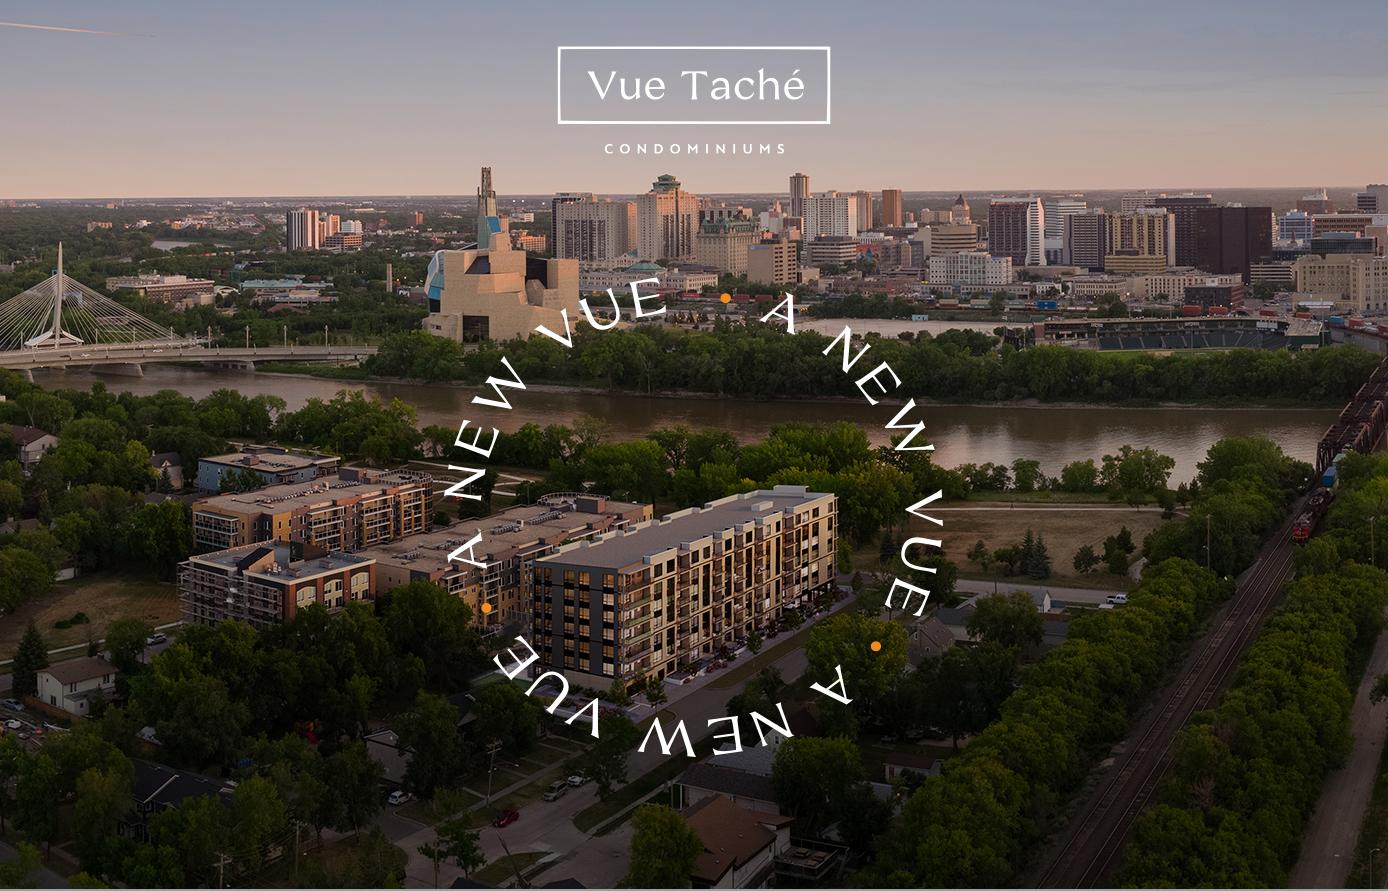 Skyline view of St. Bonifice in Winnipeg featuring Vue Tache